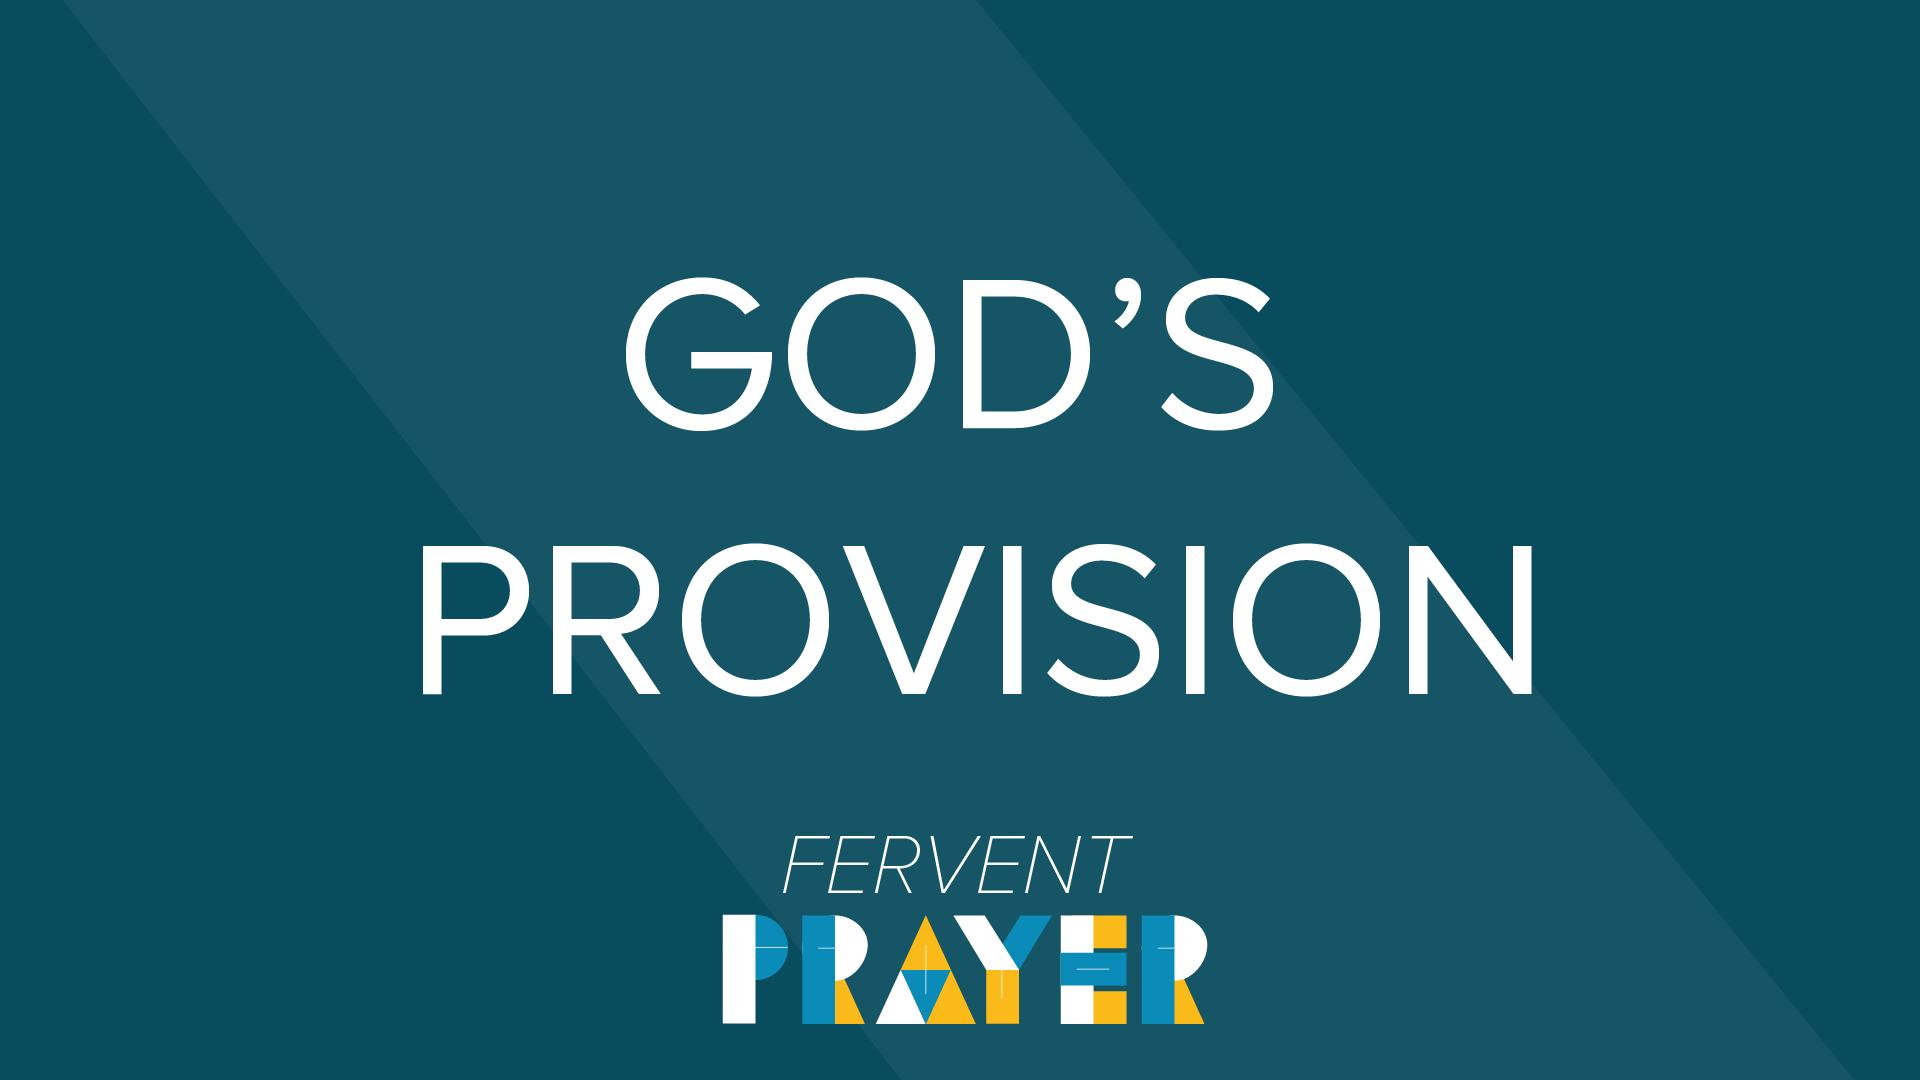 Fervent Prayer God's Provision & Providence